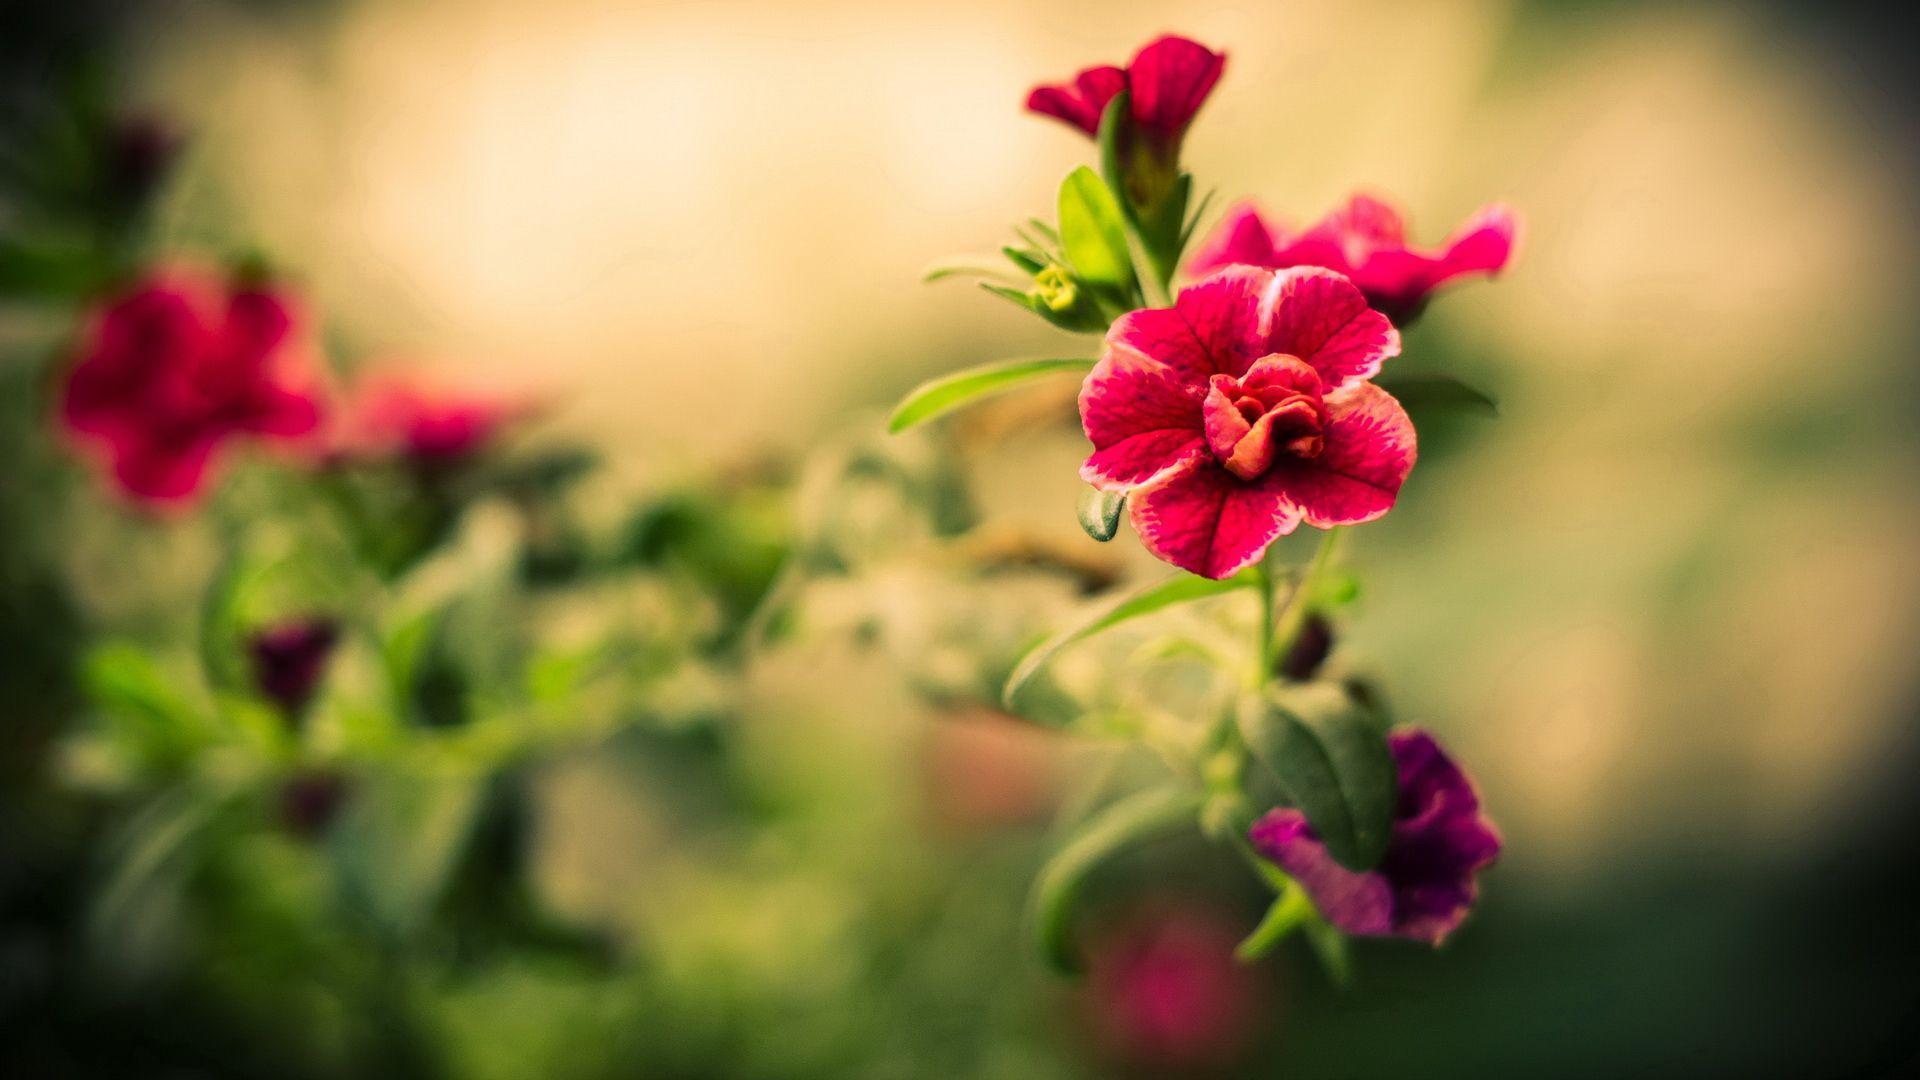 Best Of Flowers Hd Wallpapers Top Free Best Of Flowers Hd